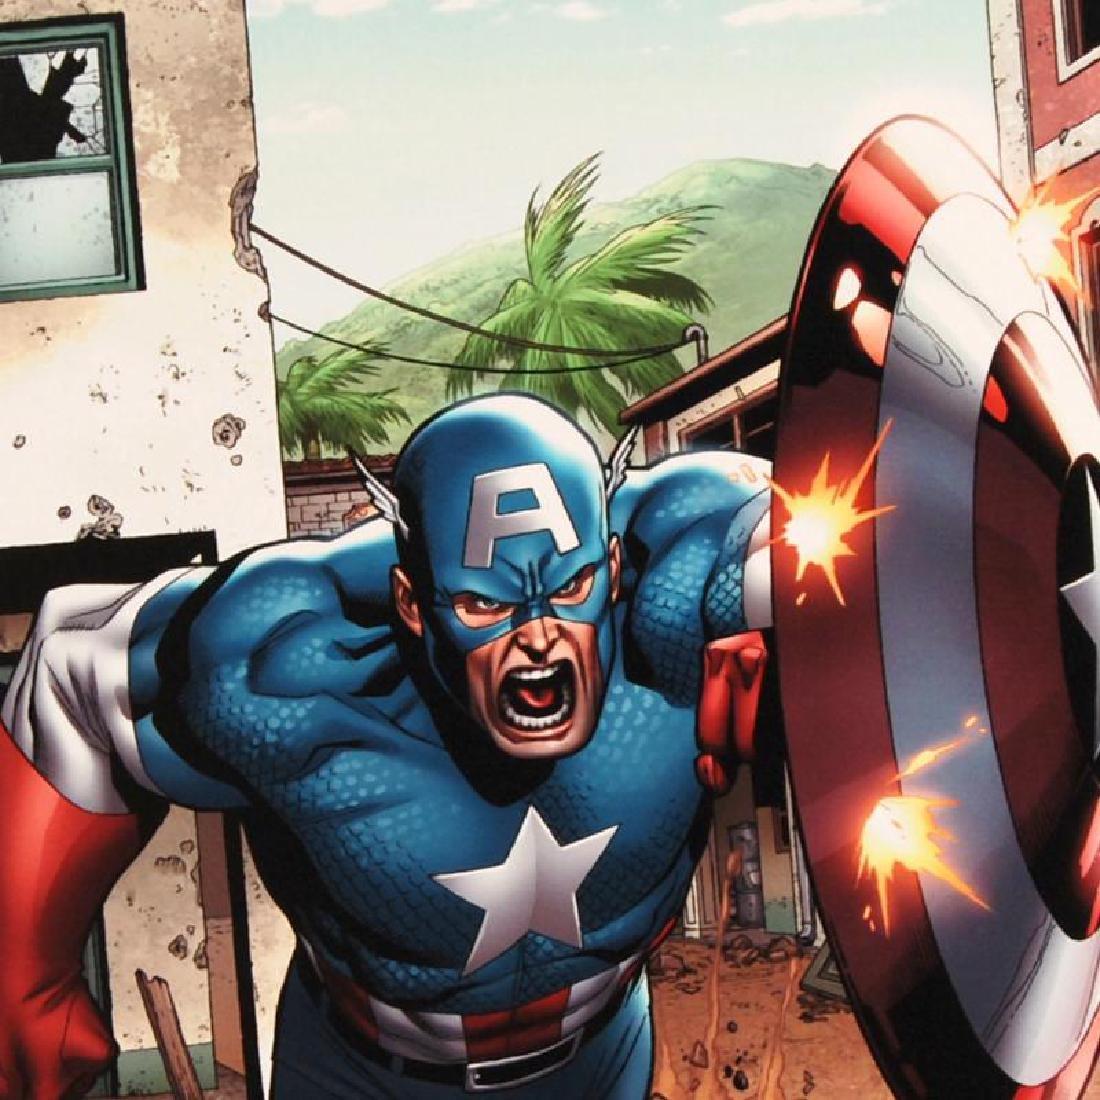 Marvel Adventures: Super Heroes #8 by Marvel Comics - 2